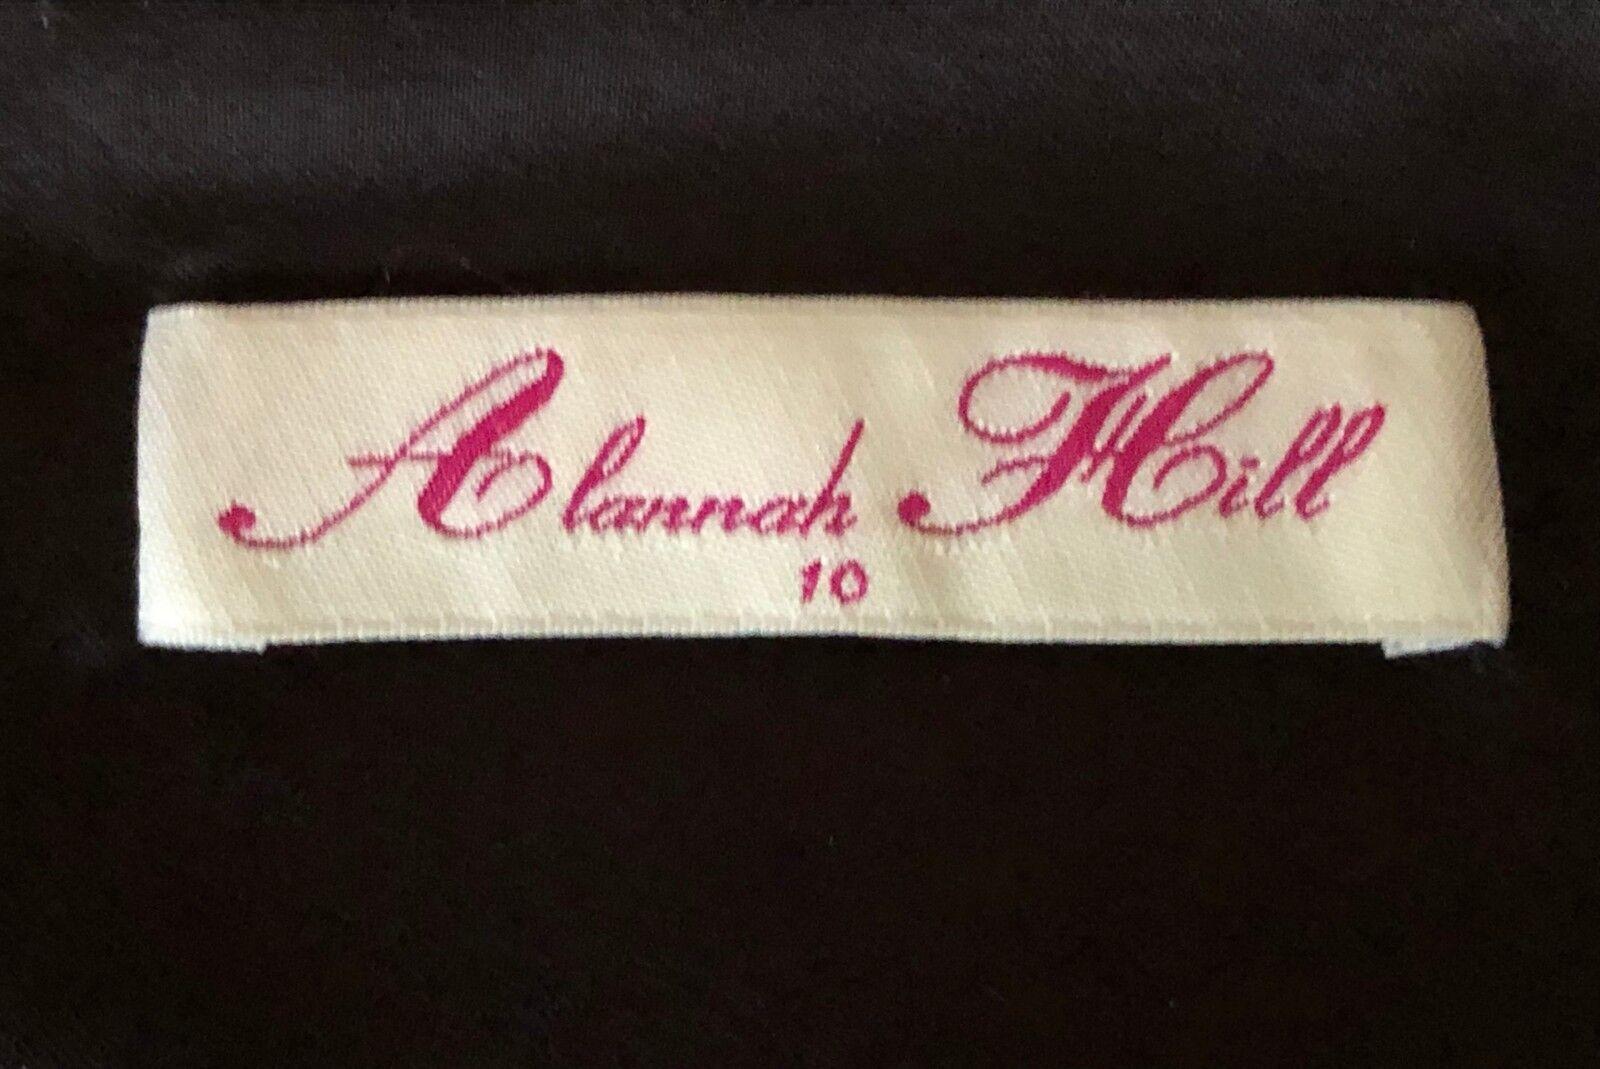 NWOT Alannah Hill pink Tinted Life Maxi Maxi Maxi Dress size (AUS) 10 (INT) small (US) 6. 43398b